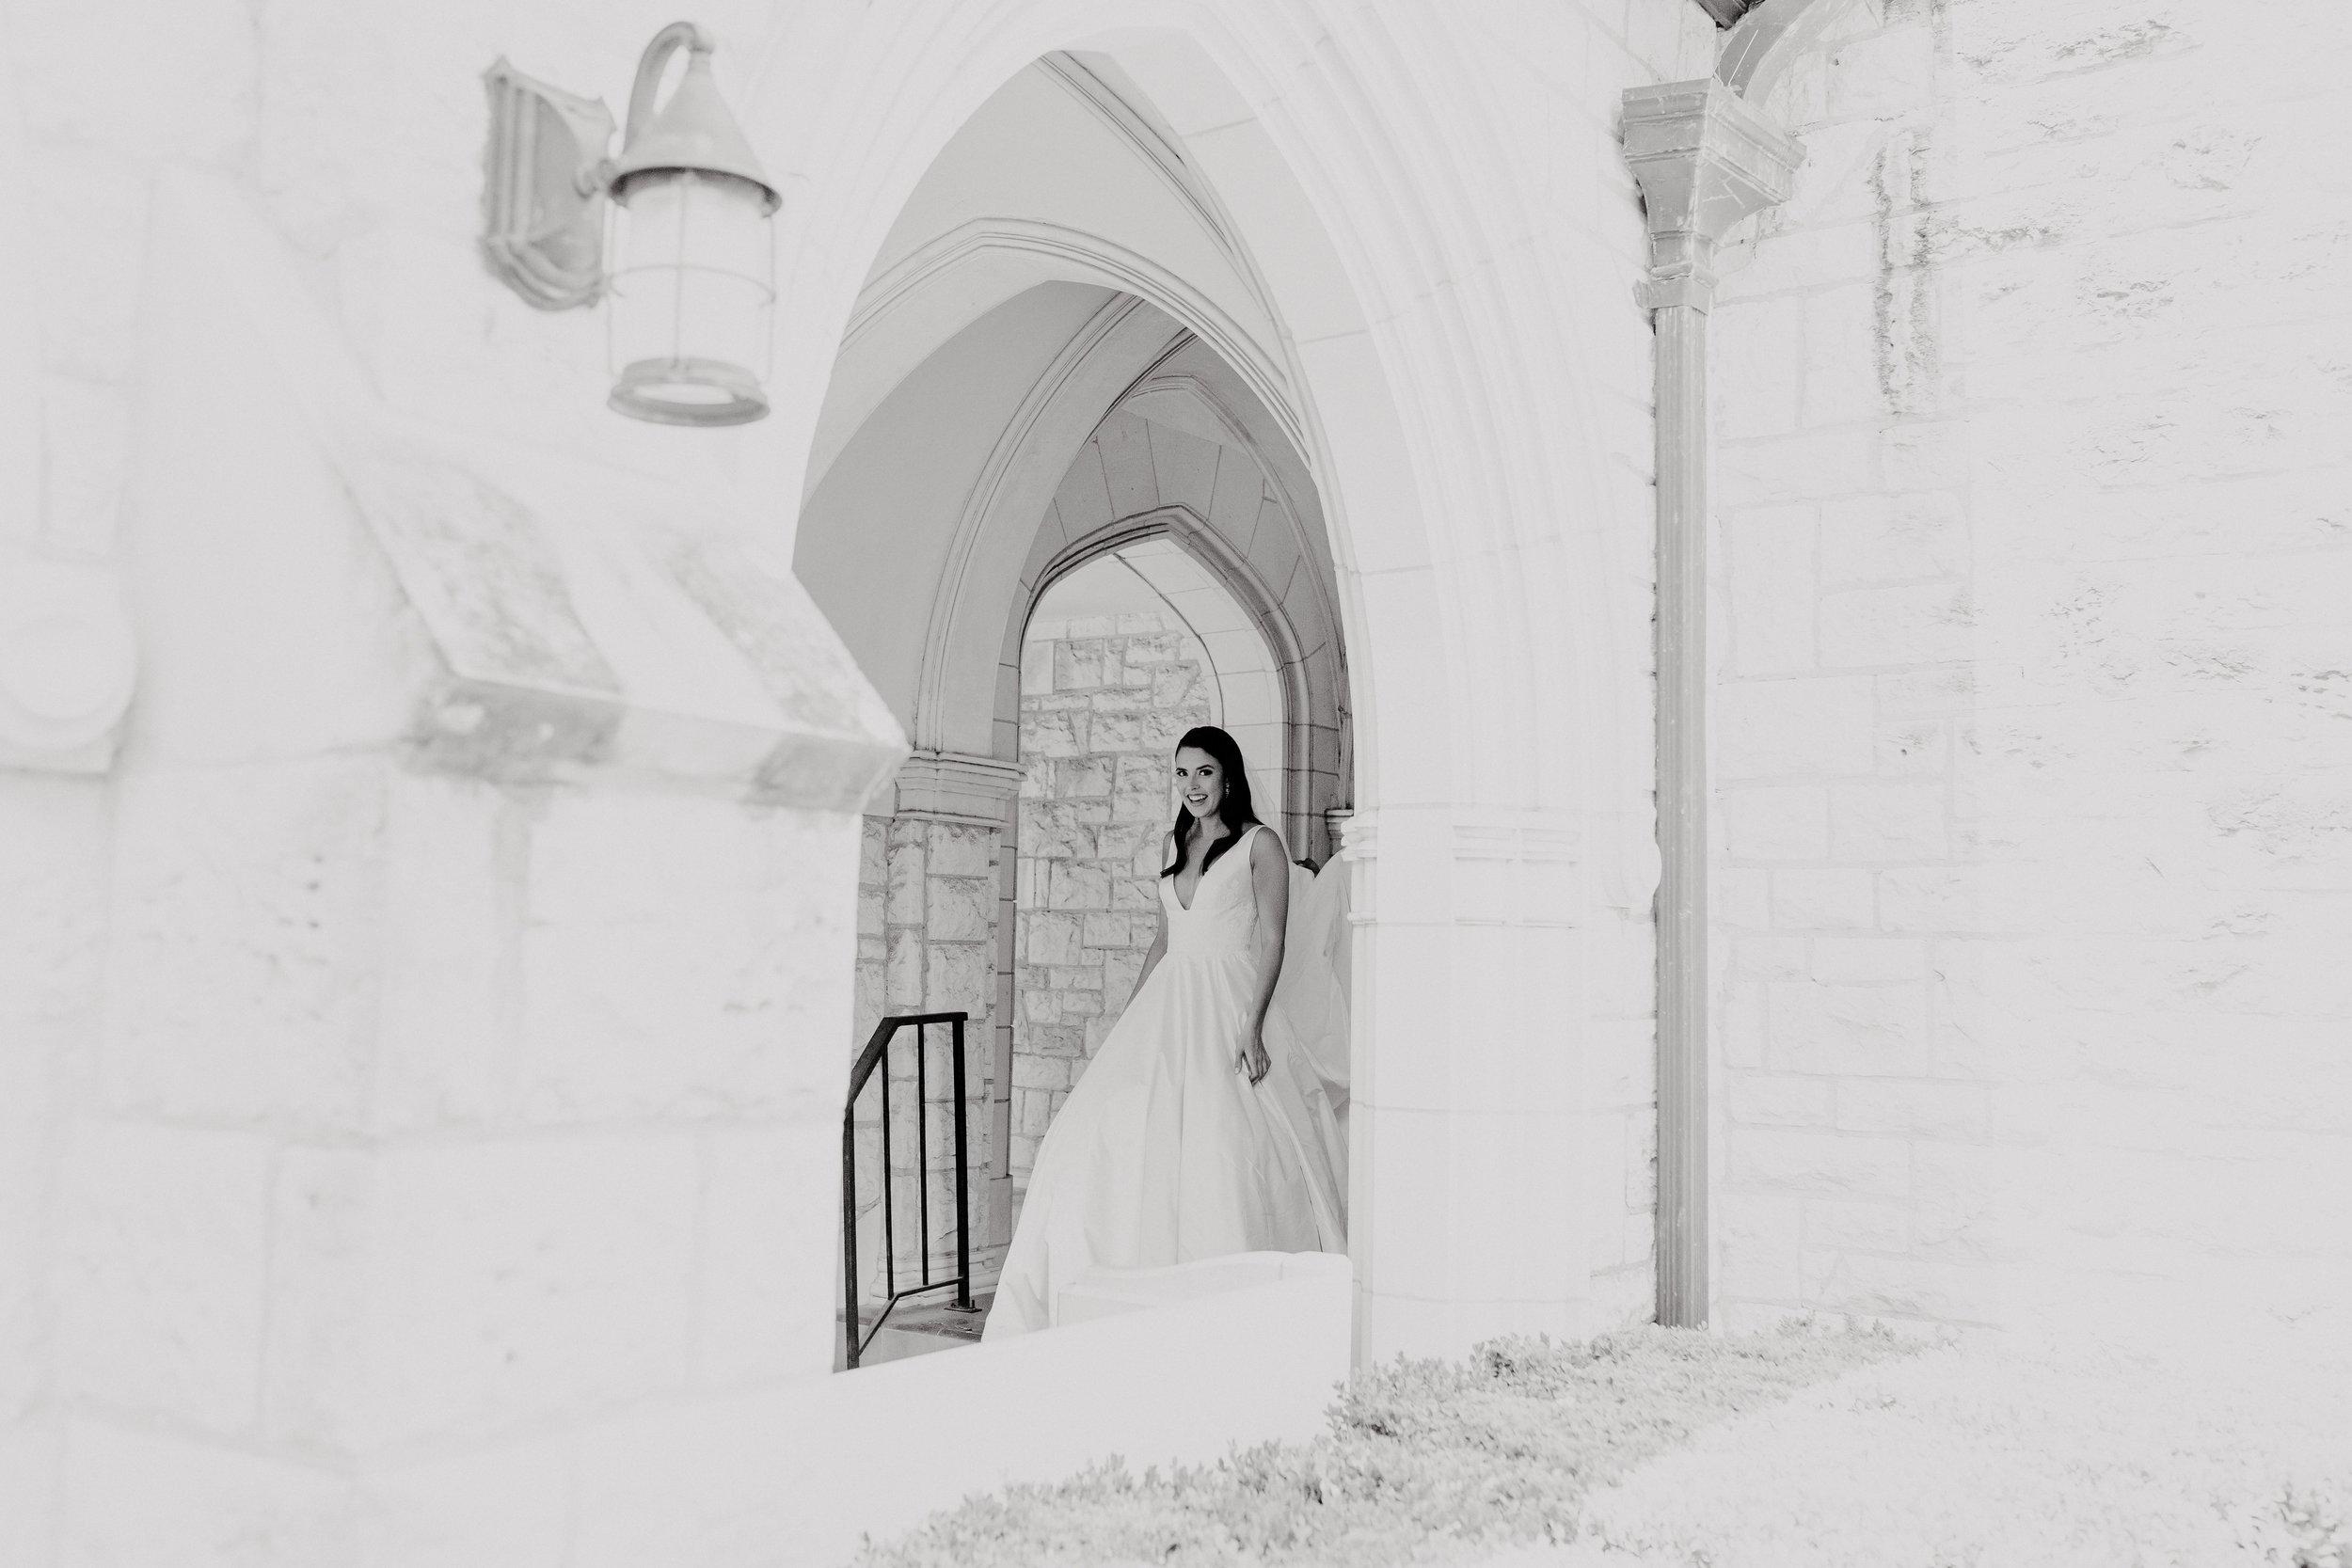 st-anthony-hotel-wedding-photography-10041san-antonio.JPG